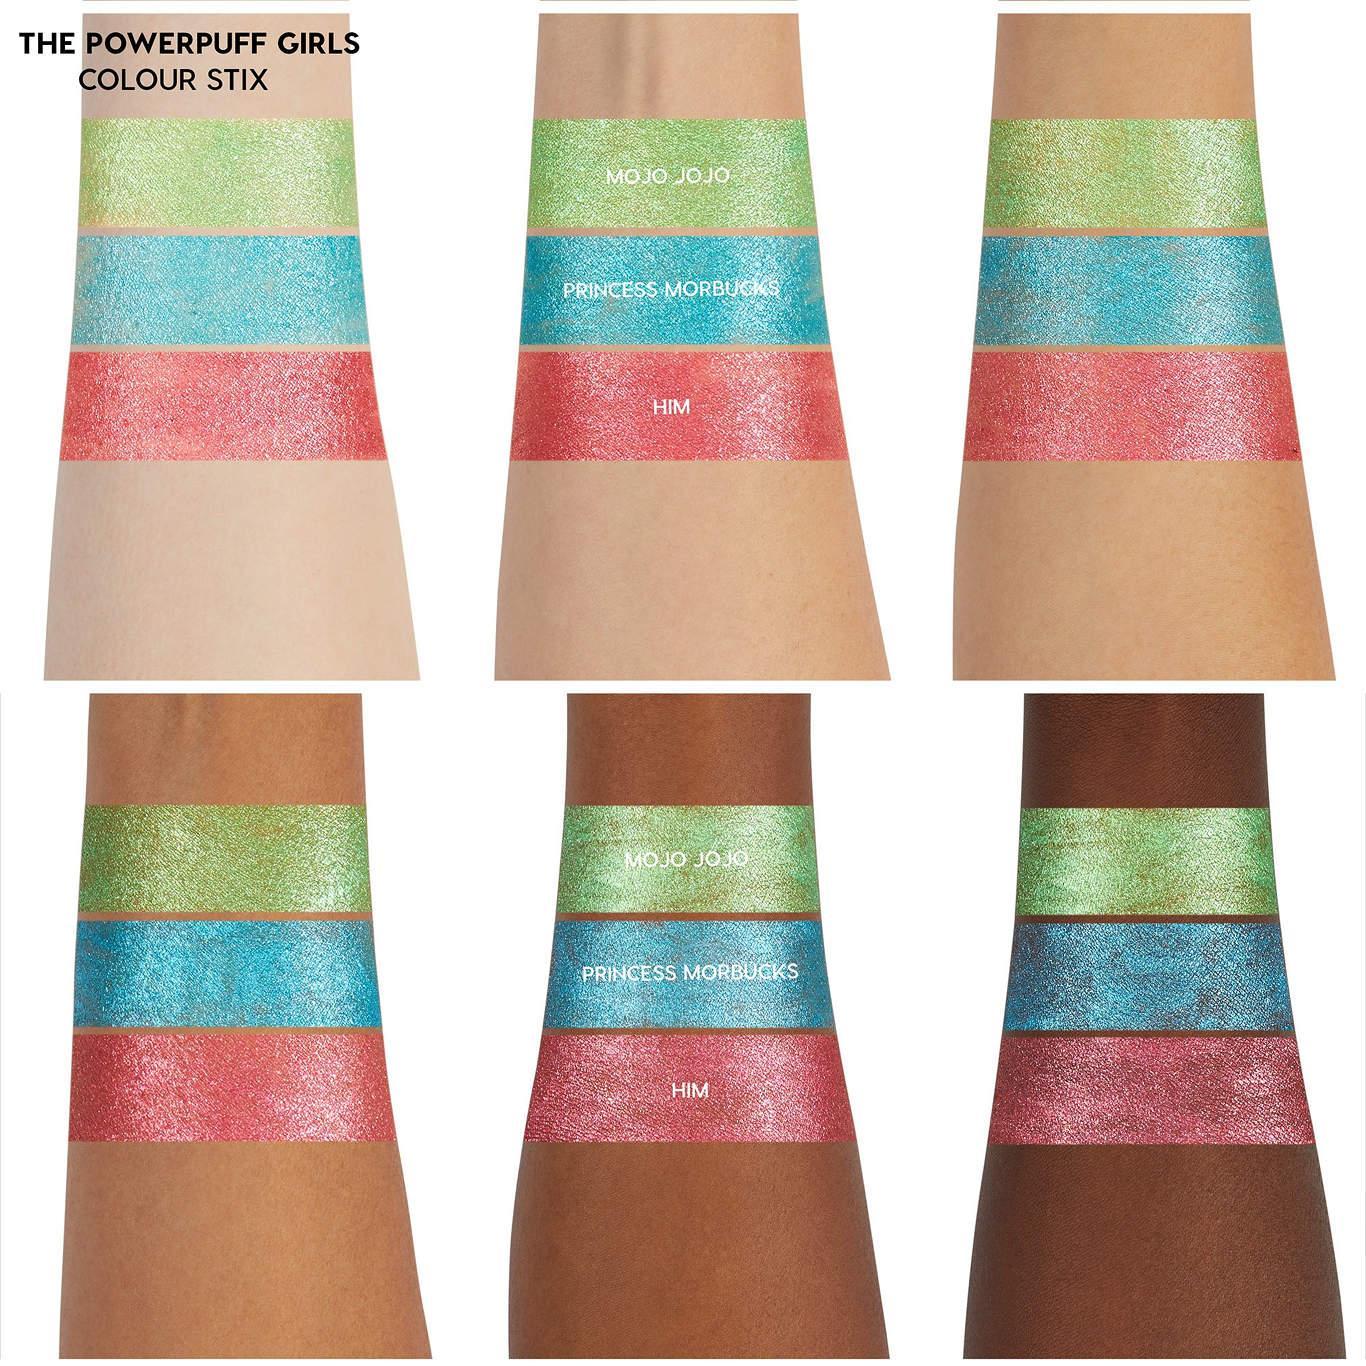 ColourPop Cosmetics The Powerpuff Girls x ColourPop Collection Colour Stix Swatches